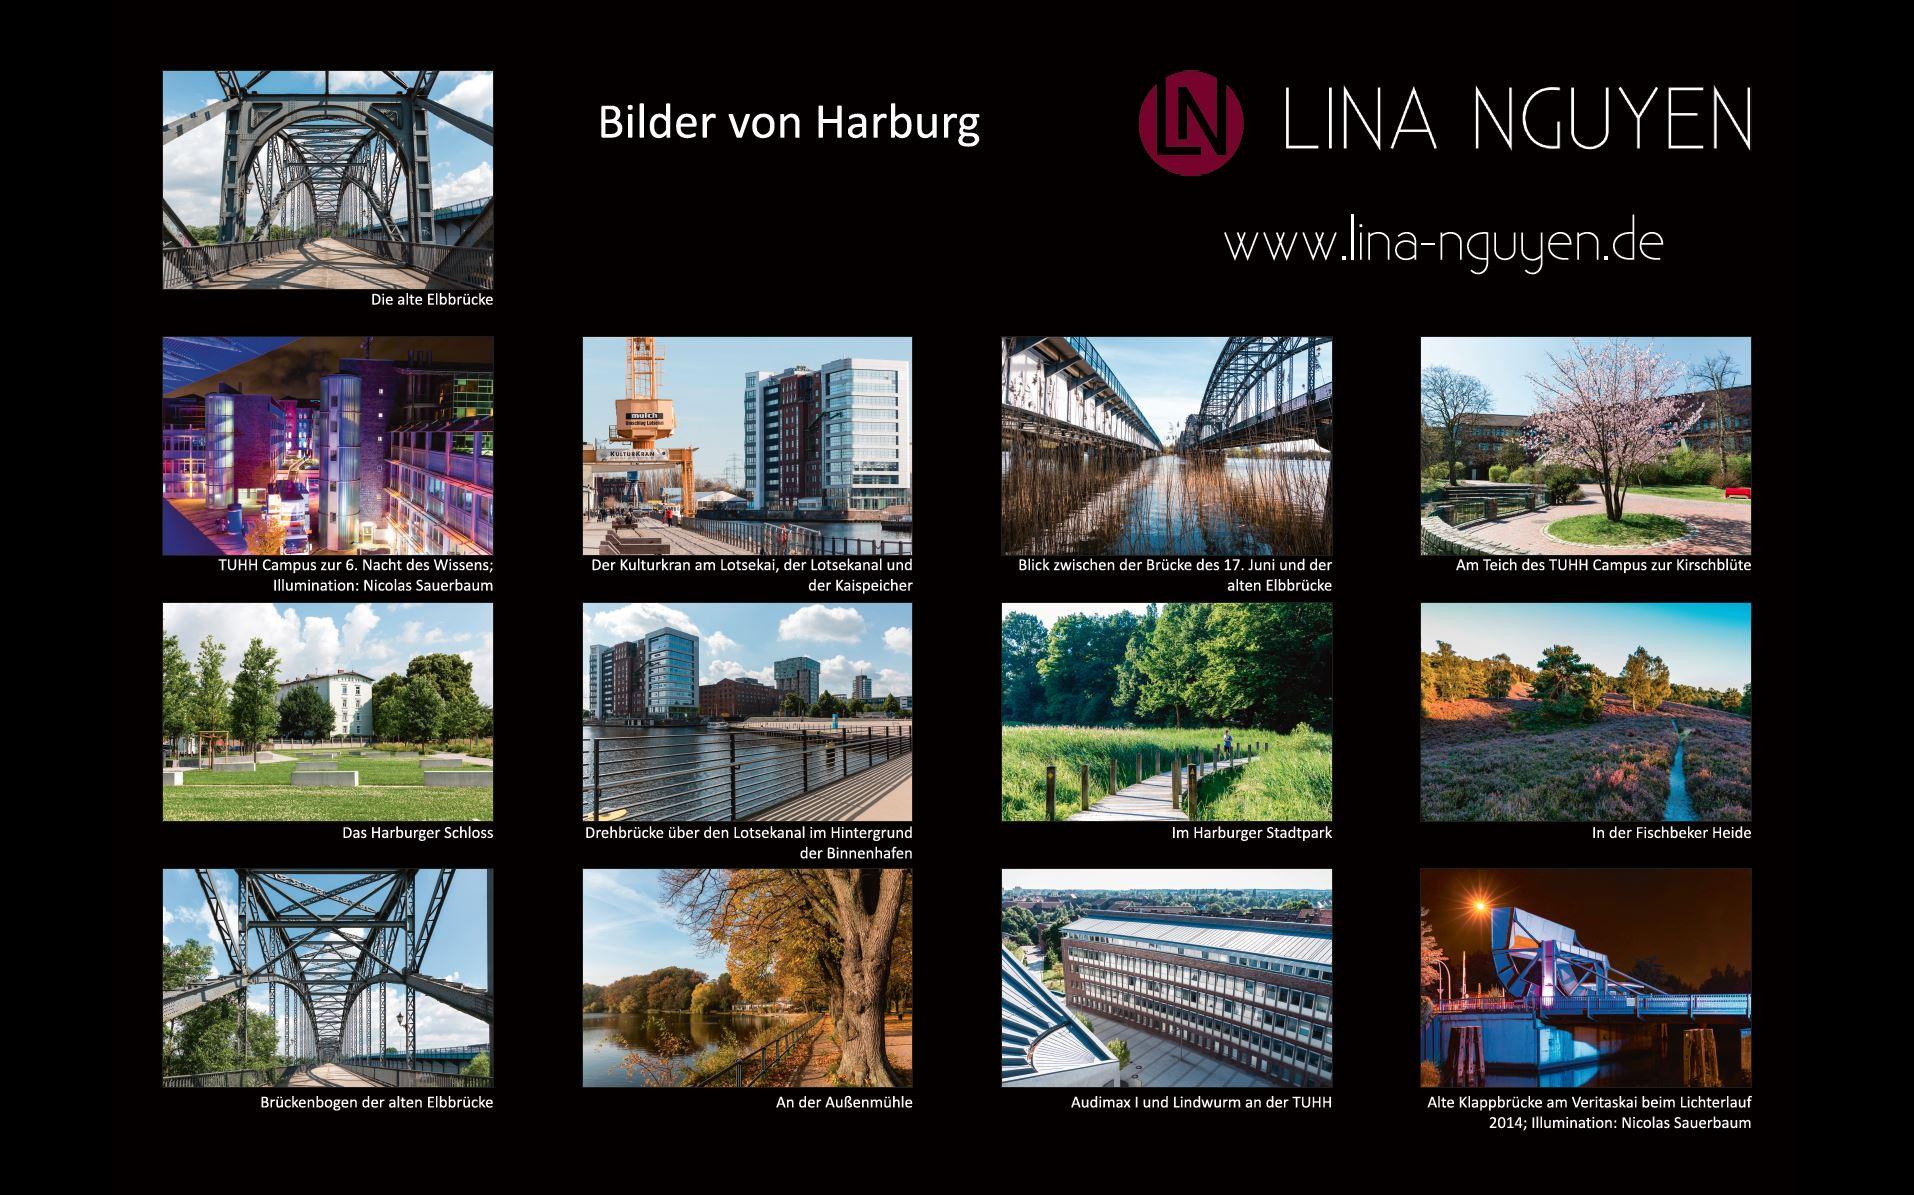 2017-harburg-kalender-lina-nguyen-uebersicht